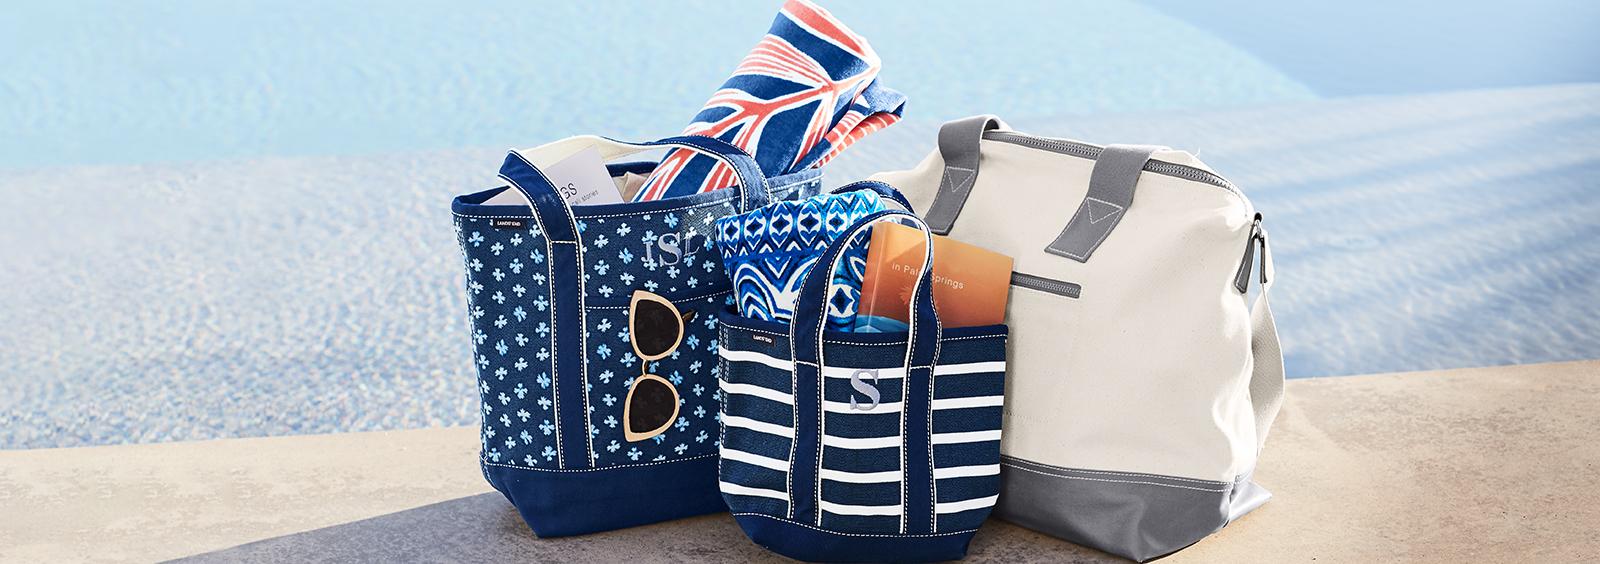 Best Bags for Summer Sleepovers